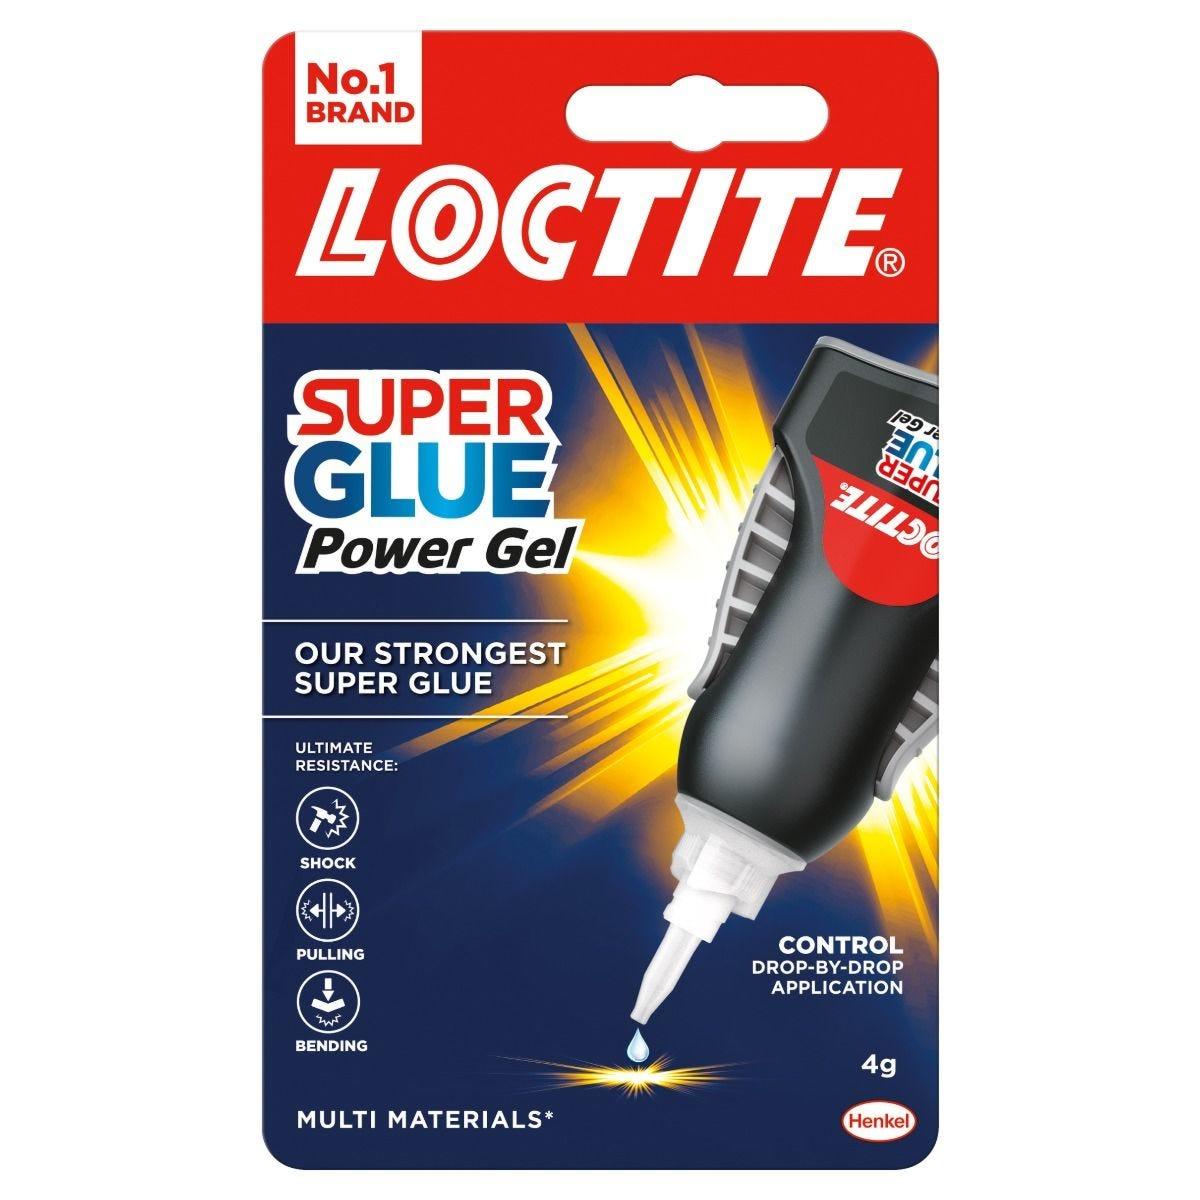 Loctite Super Glue Power Gel Control - 4g